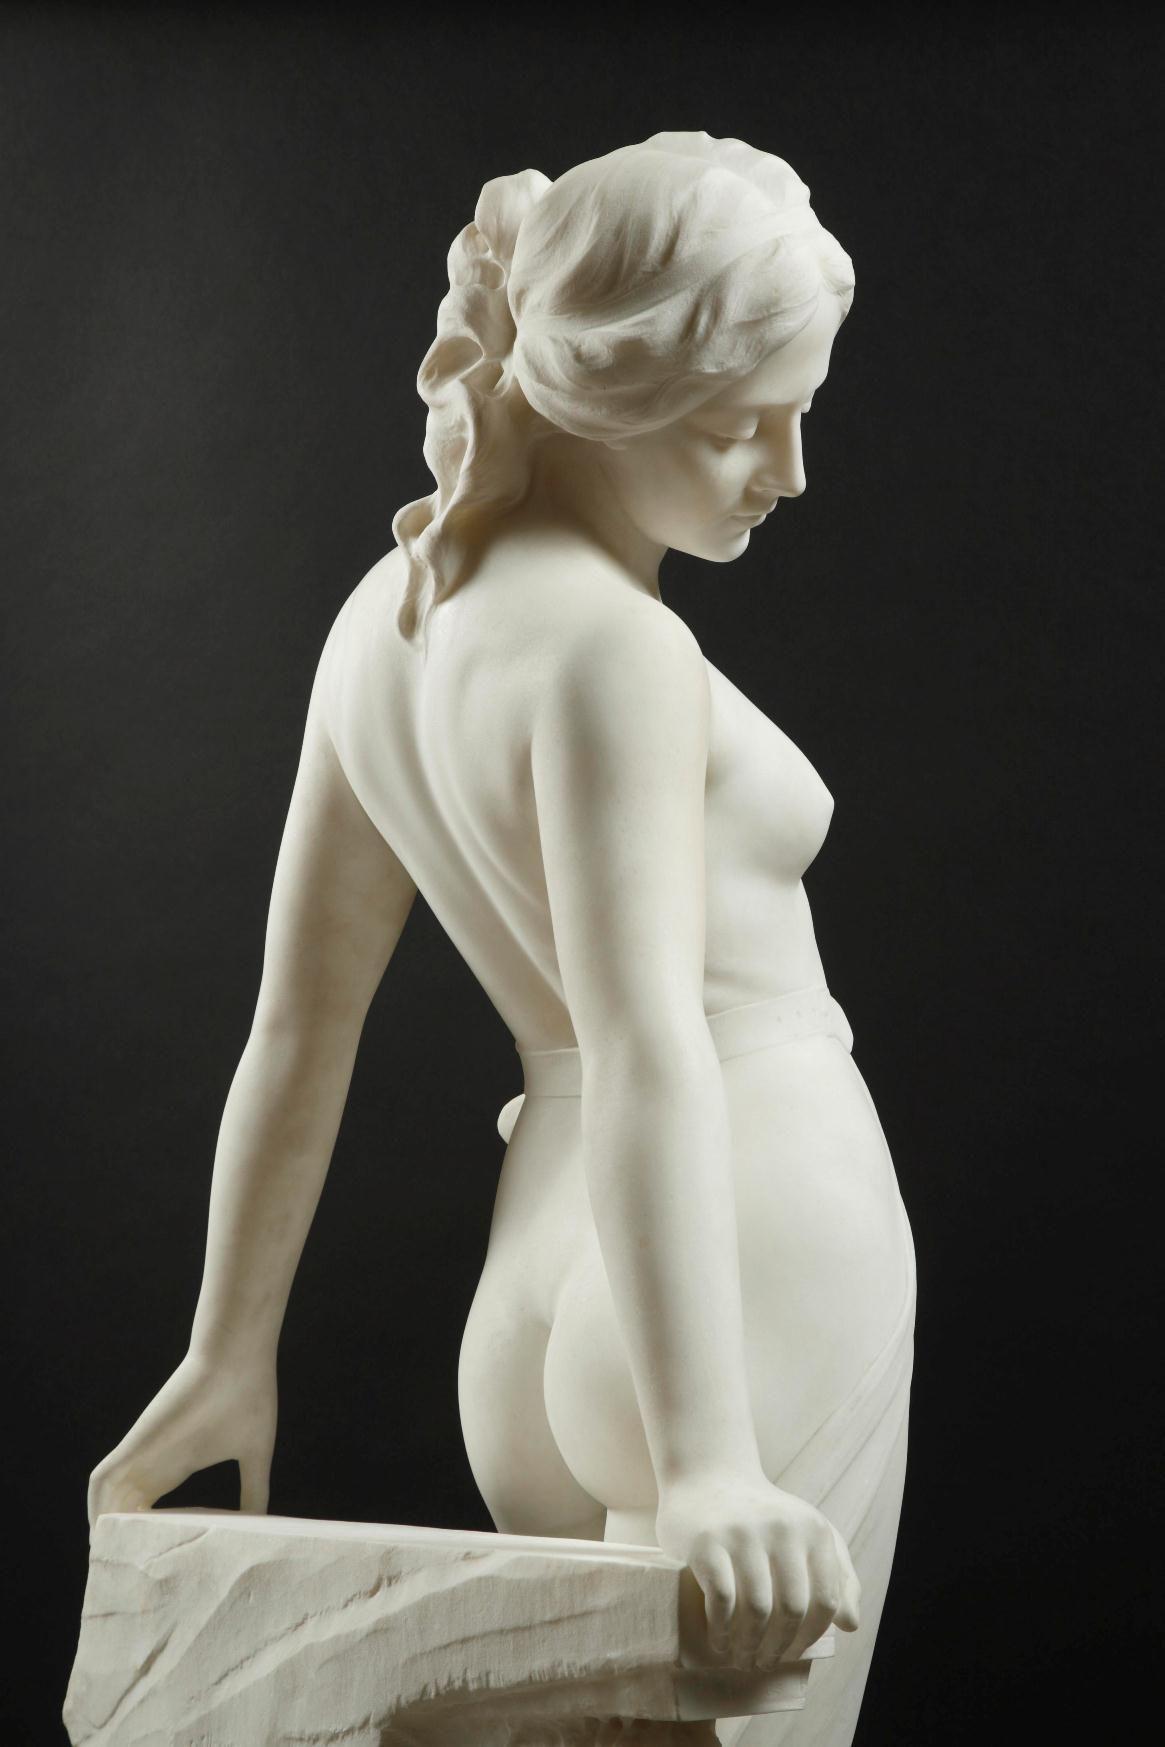 Nude gargoyle woman images pic 124